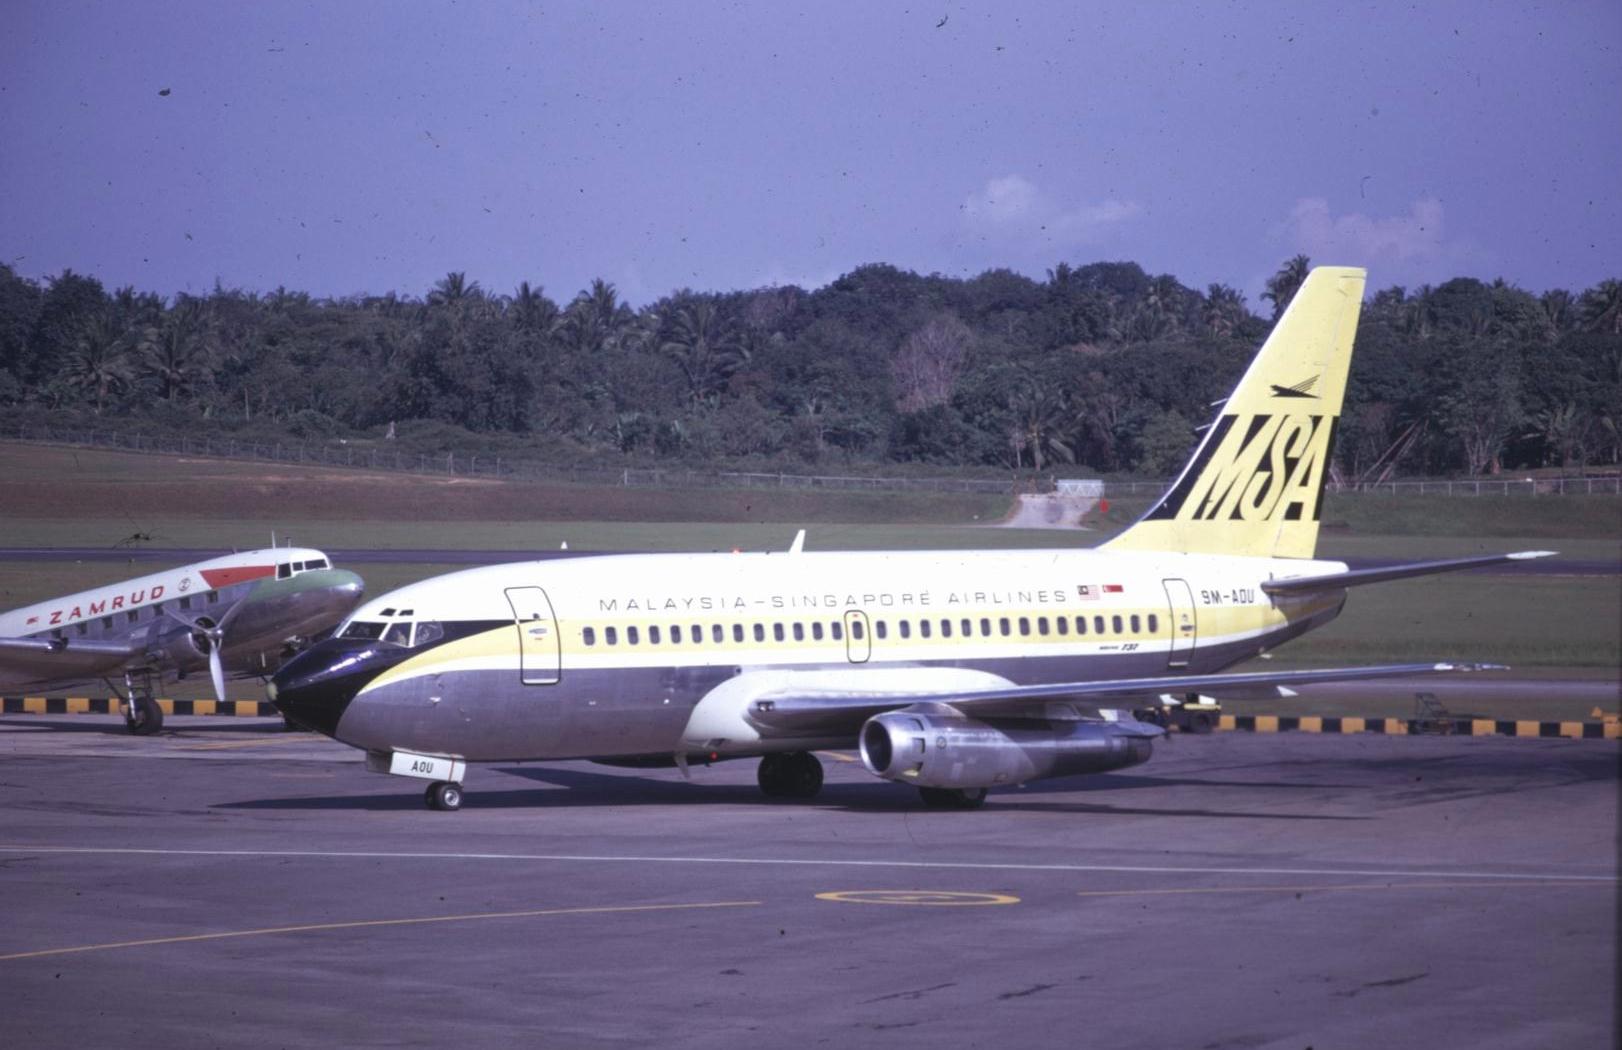 MHSQ History 737-200